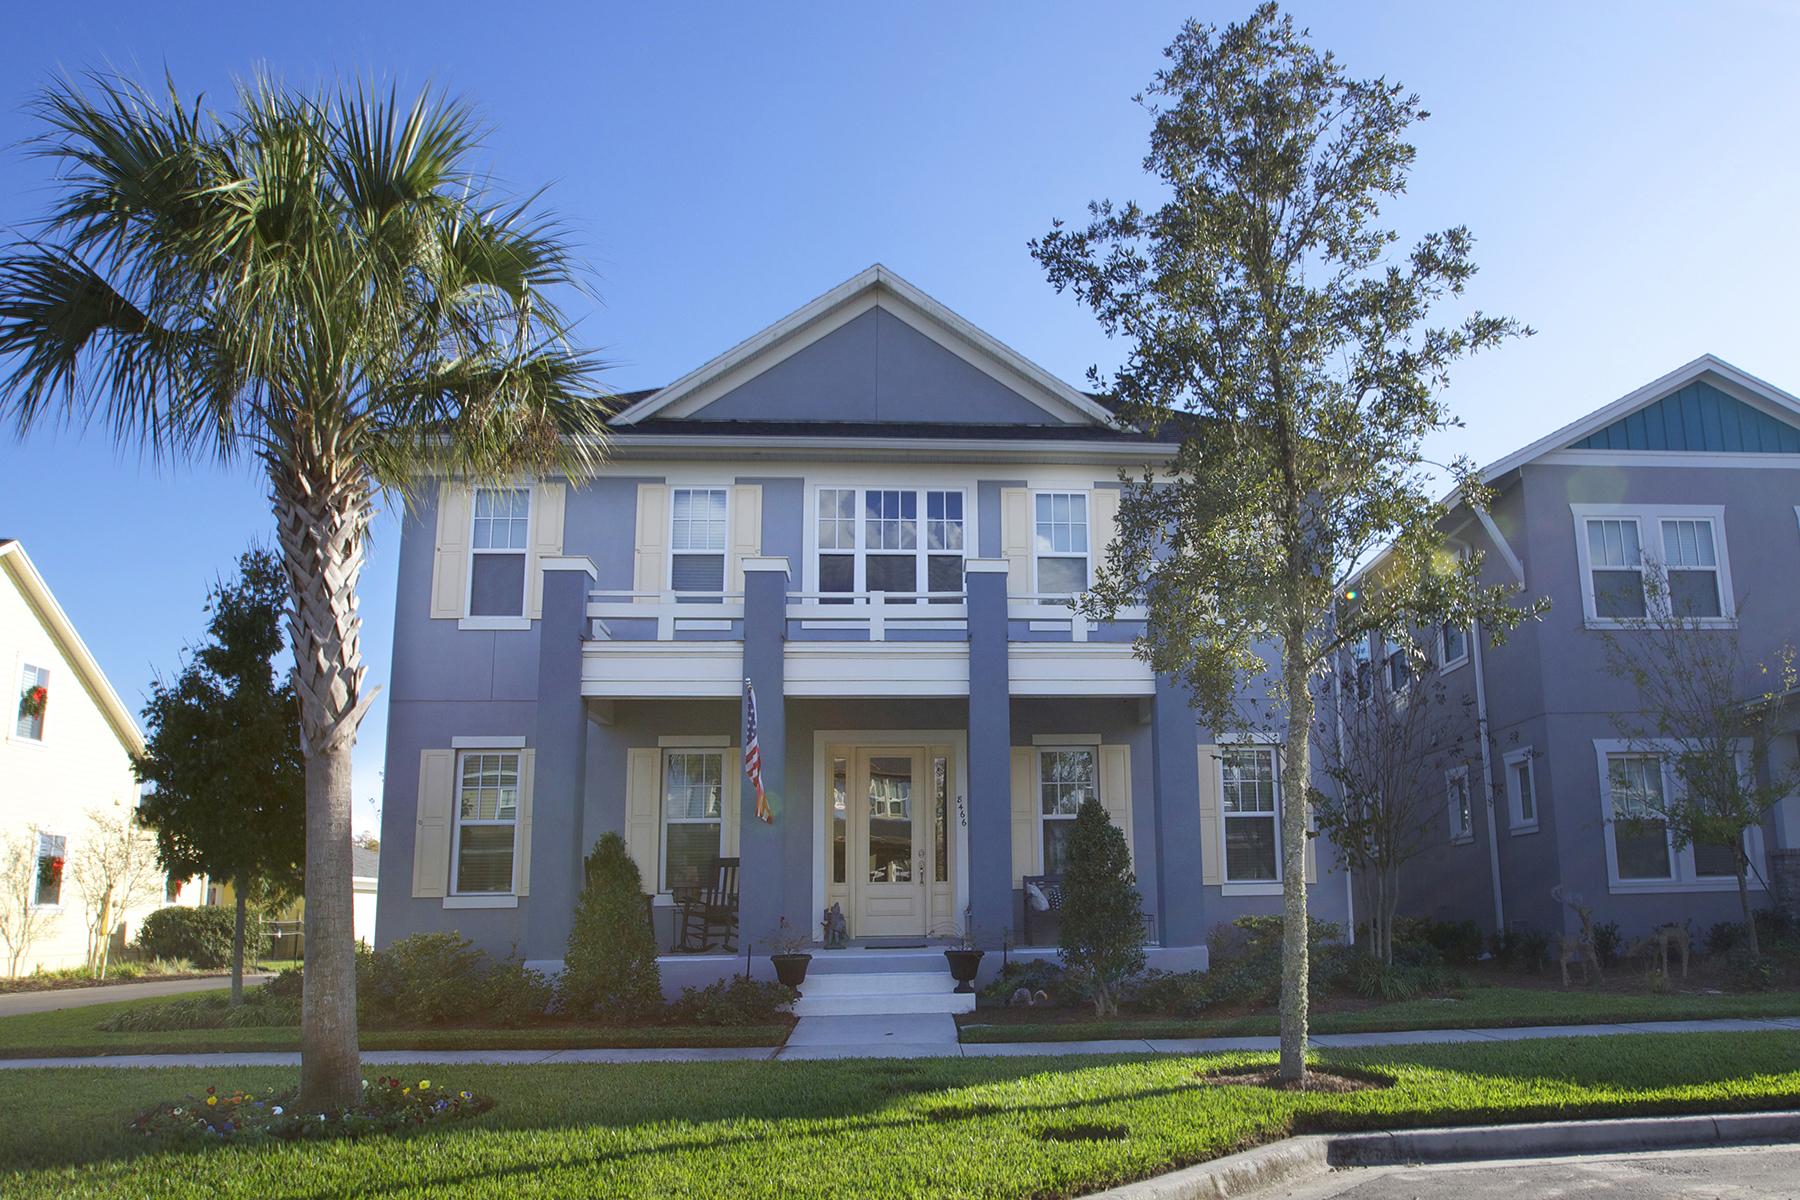 Nhà ở một gia đình vì Bán tại LAUREATE PARK 8466 Laureate Blvd Orlando, Florida, 32827 Hoa Kỳ